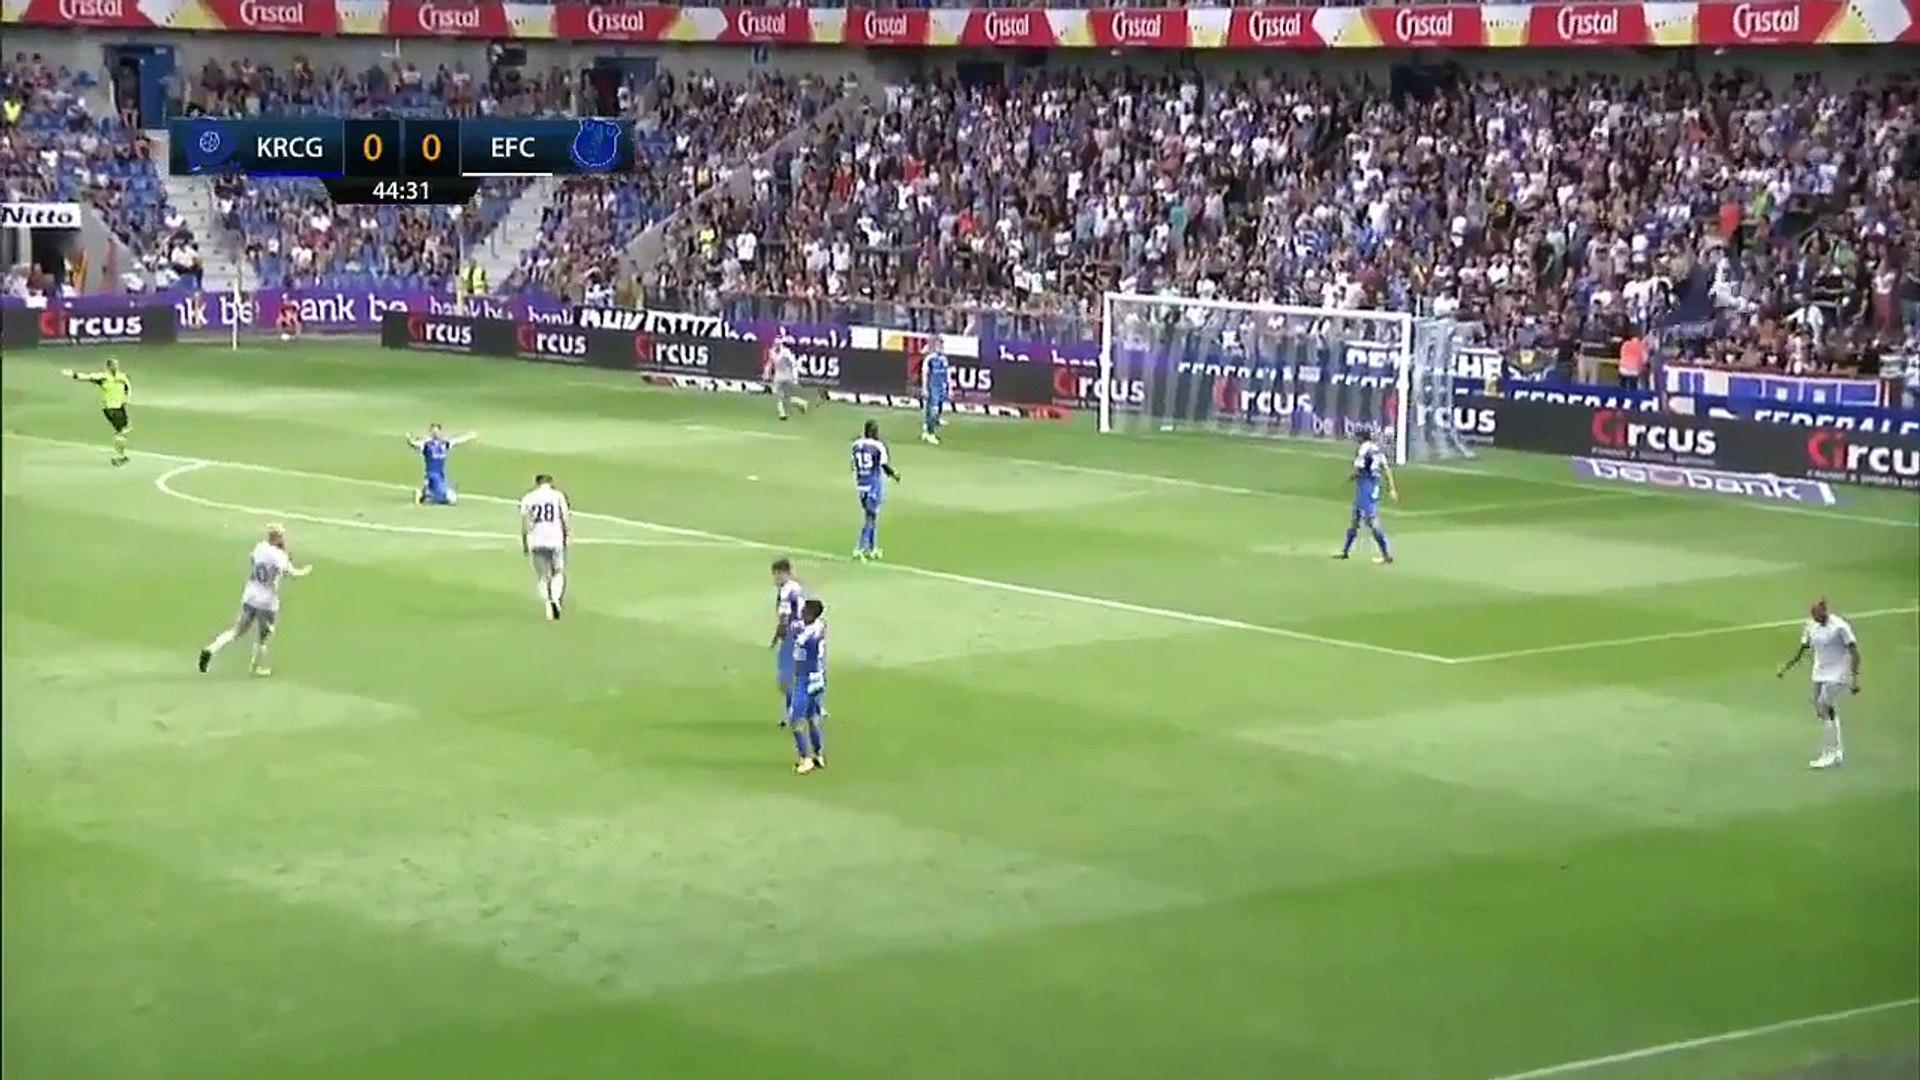 Wayne Rooney goal for Everton vs Genk - Friendly Match 22/07/2017